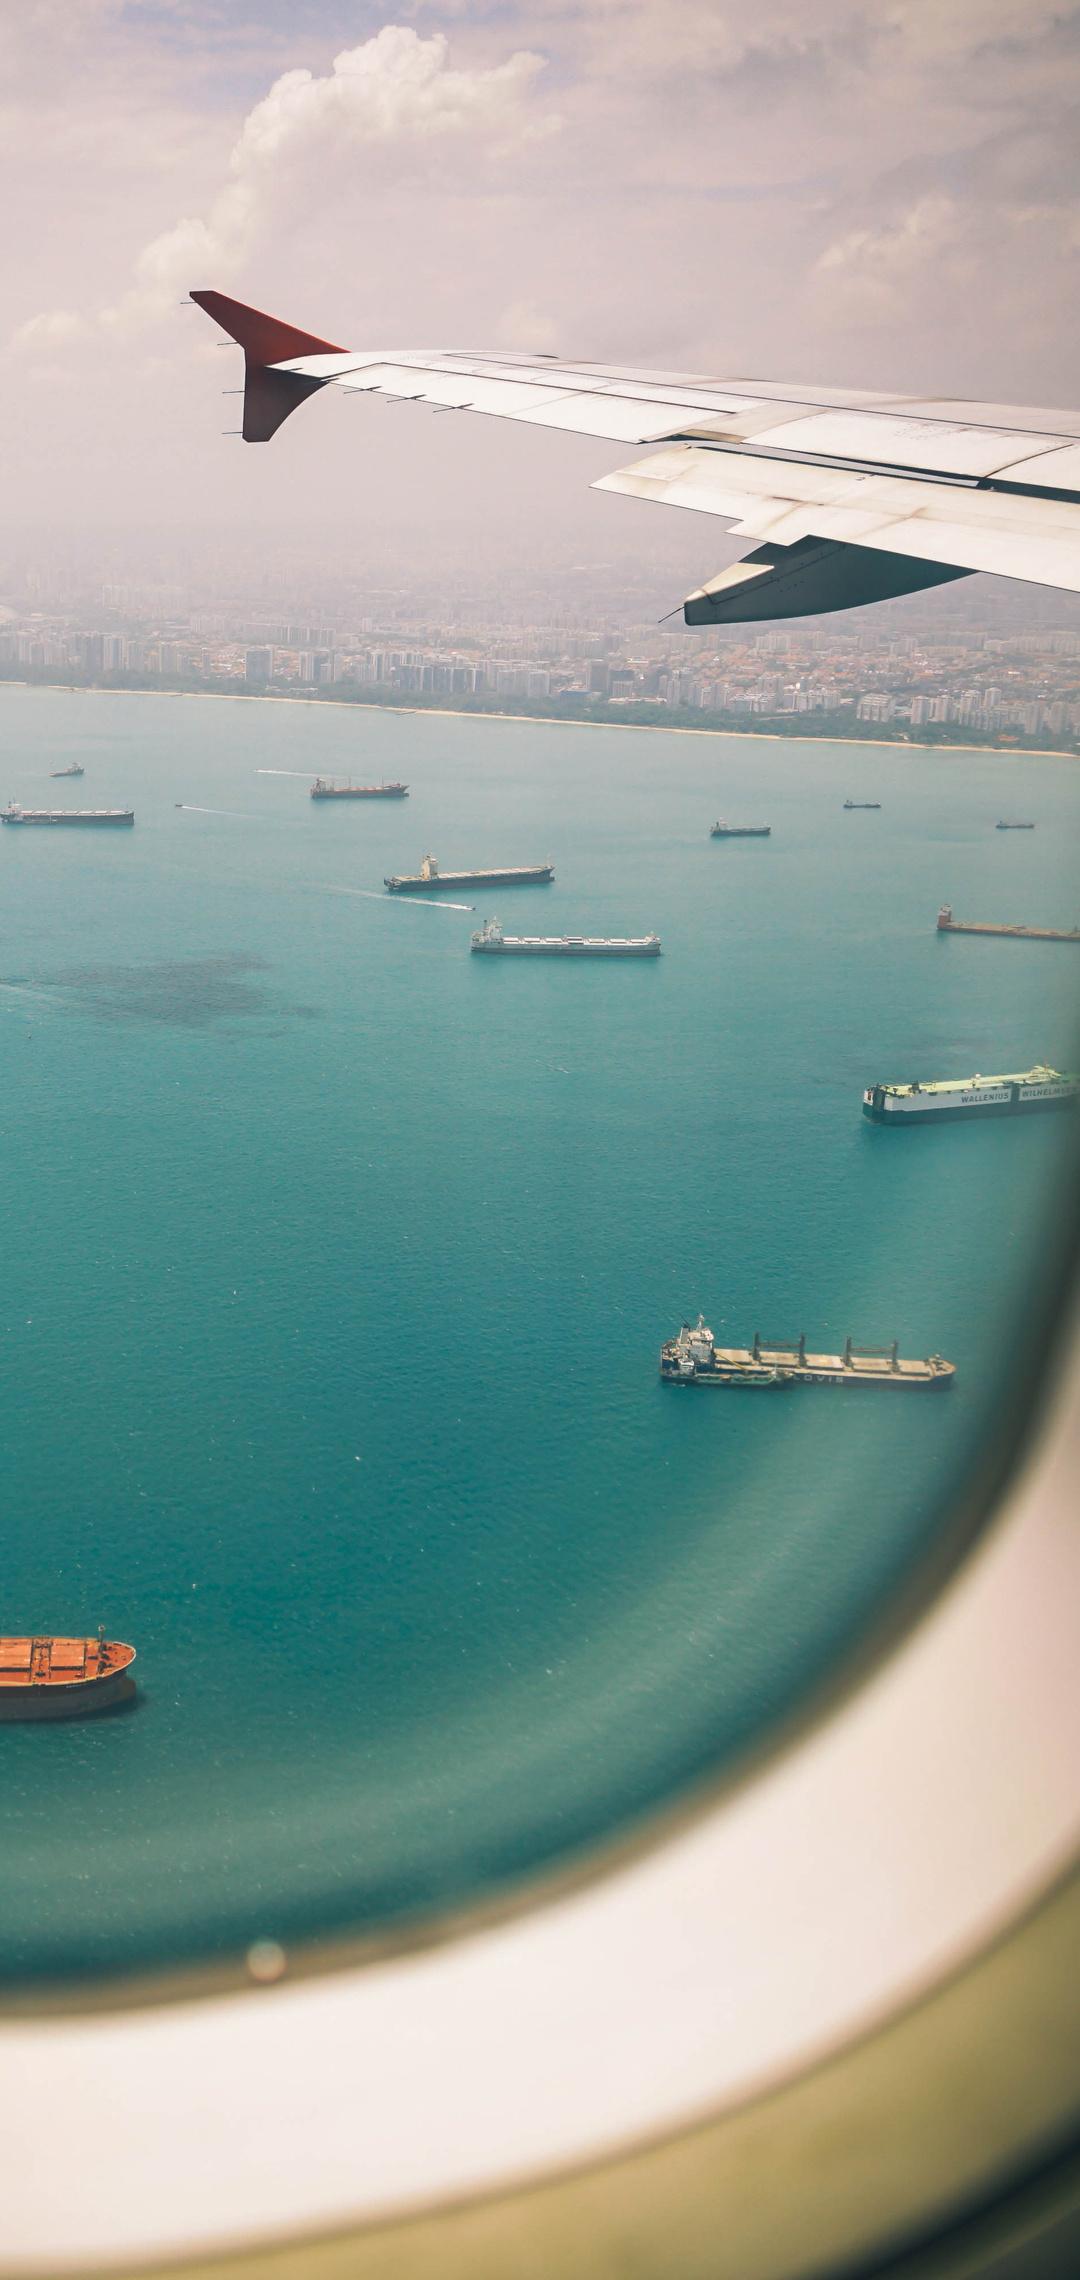 boats-sea-view-from-airplane-window-40.jpg